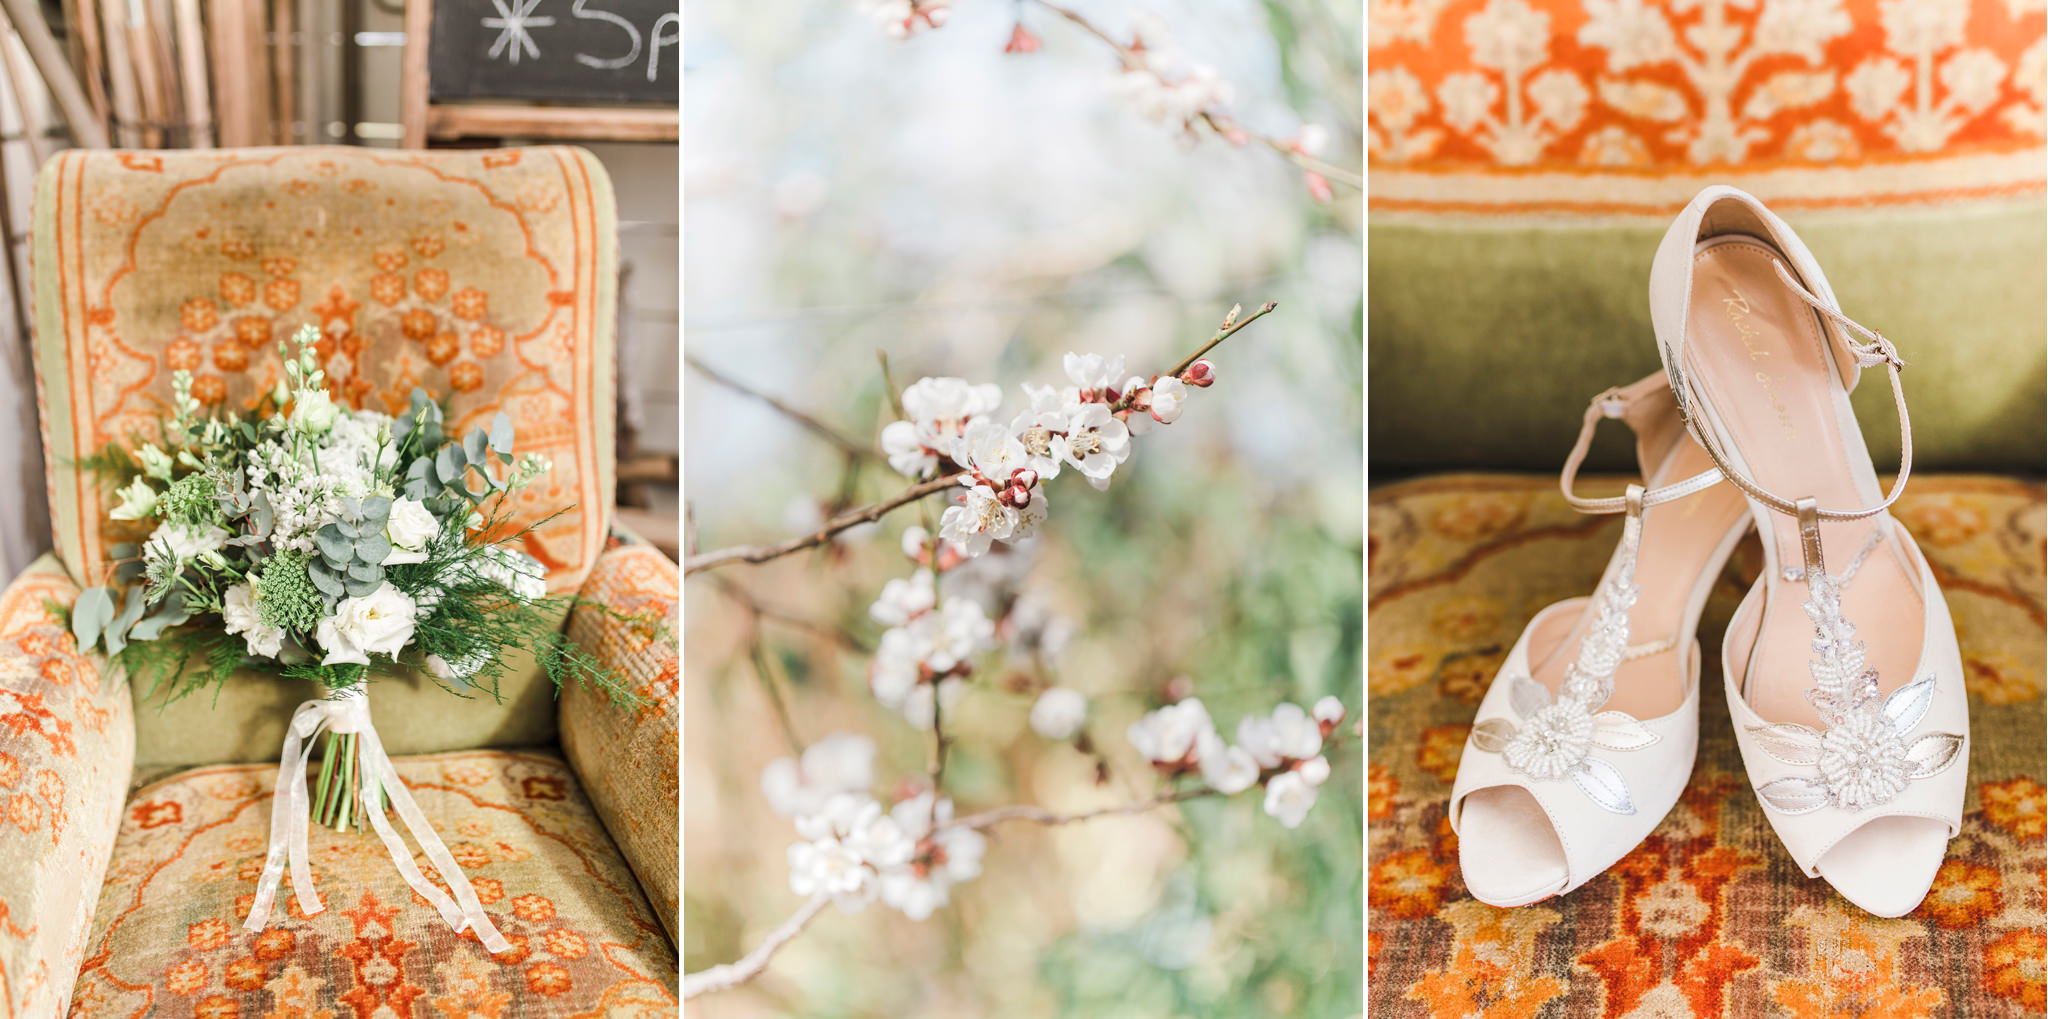 rustic-romantic-outdoor-wedding-photographer-edinburgh-03.jpg